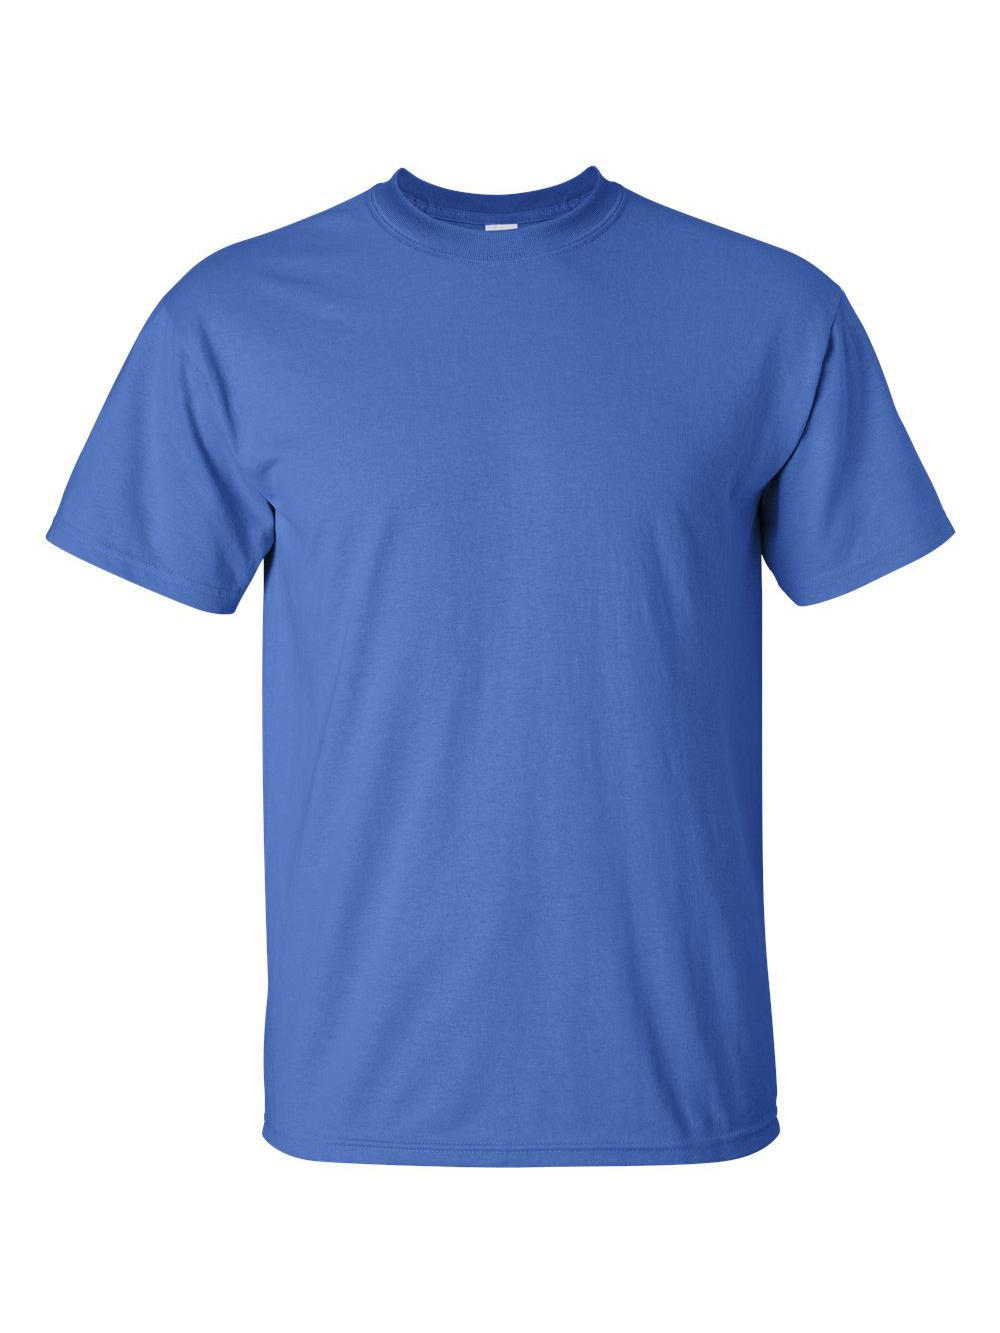 Gildan-Ultra-Cotton-T-Shirt-Tall-Sizes-2000T thumbnail 15